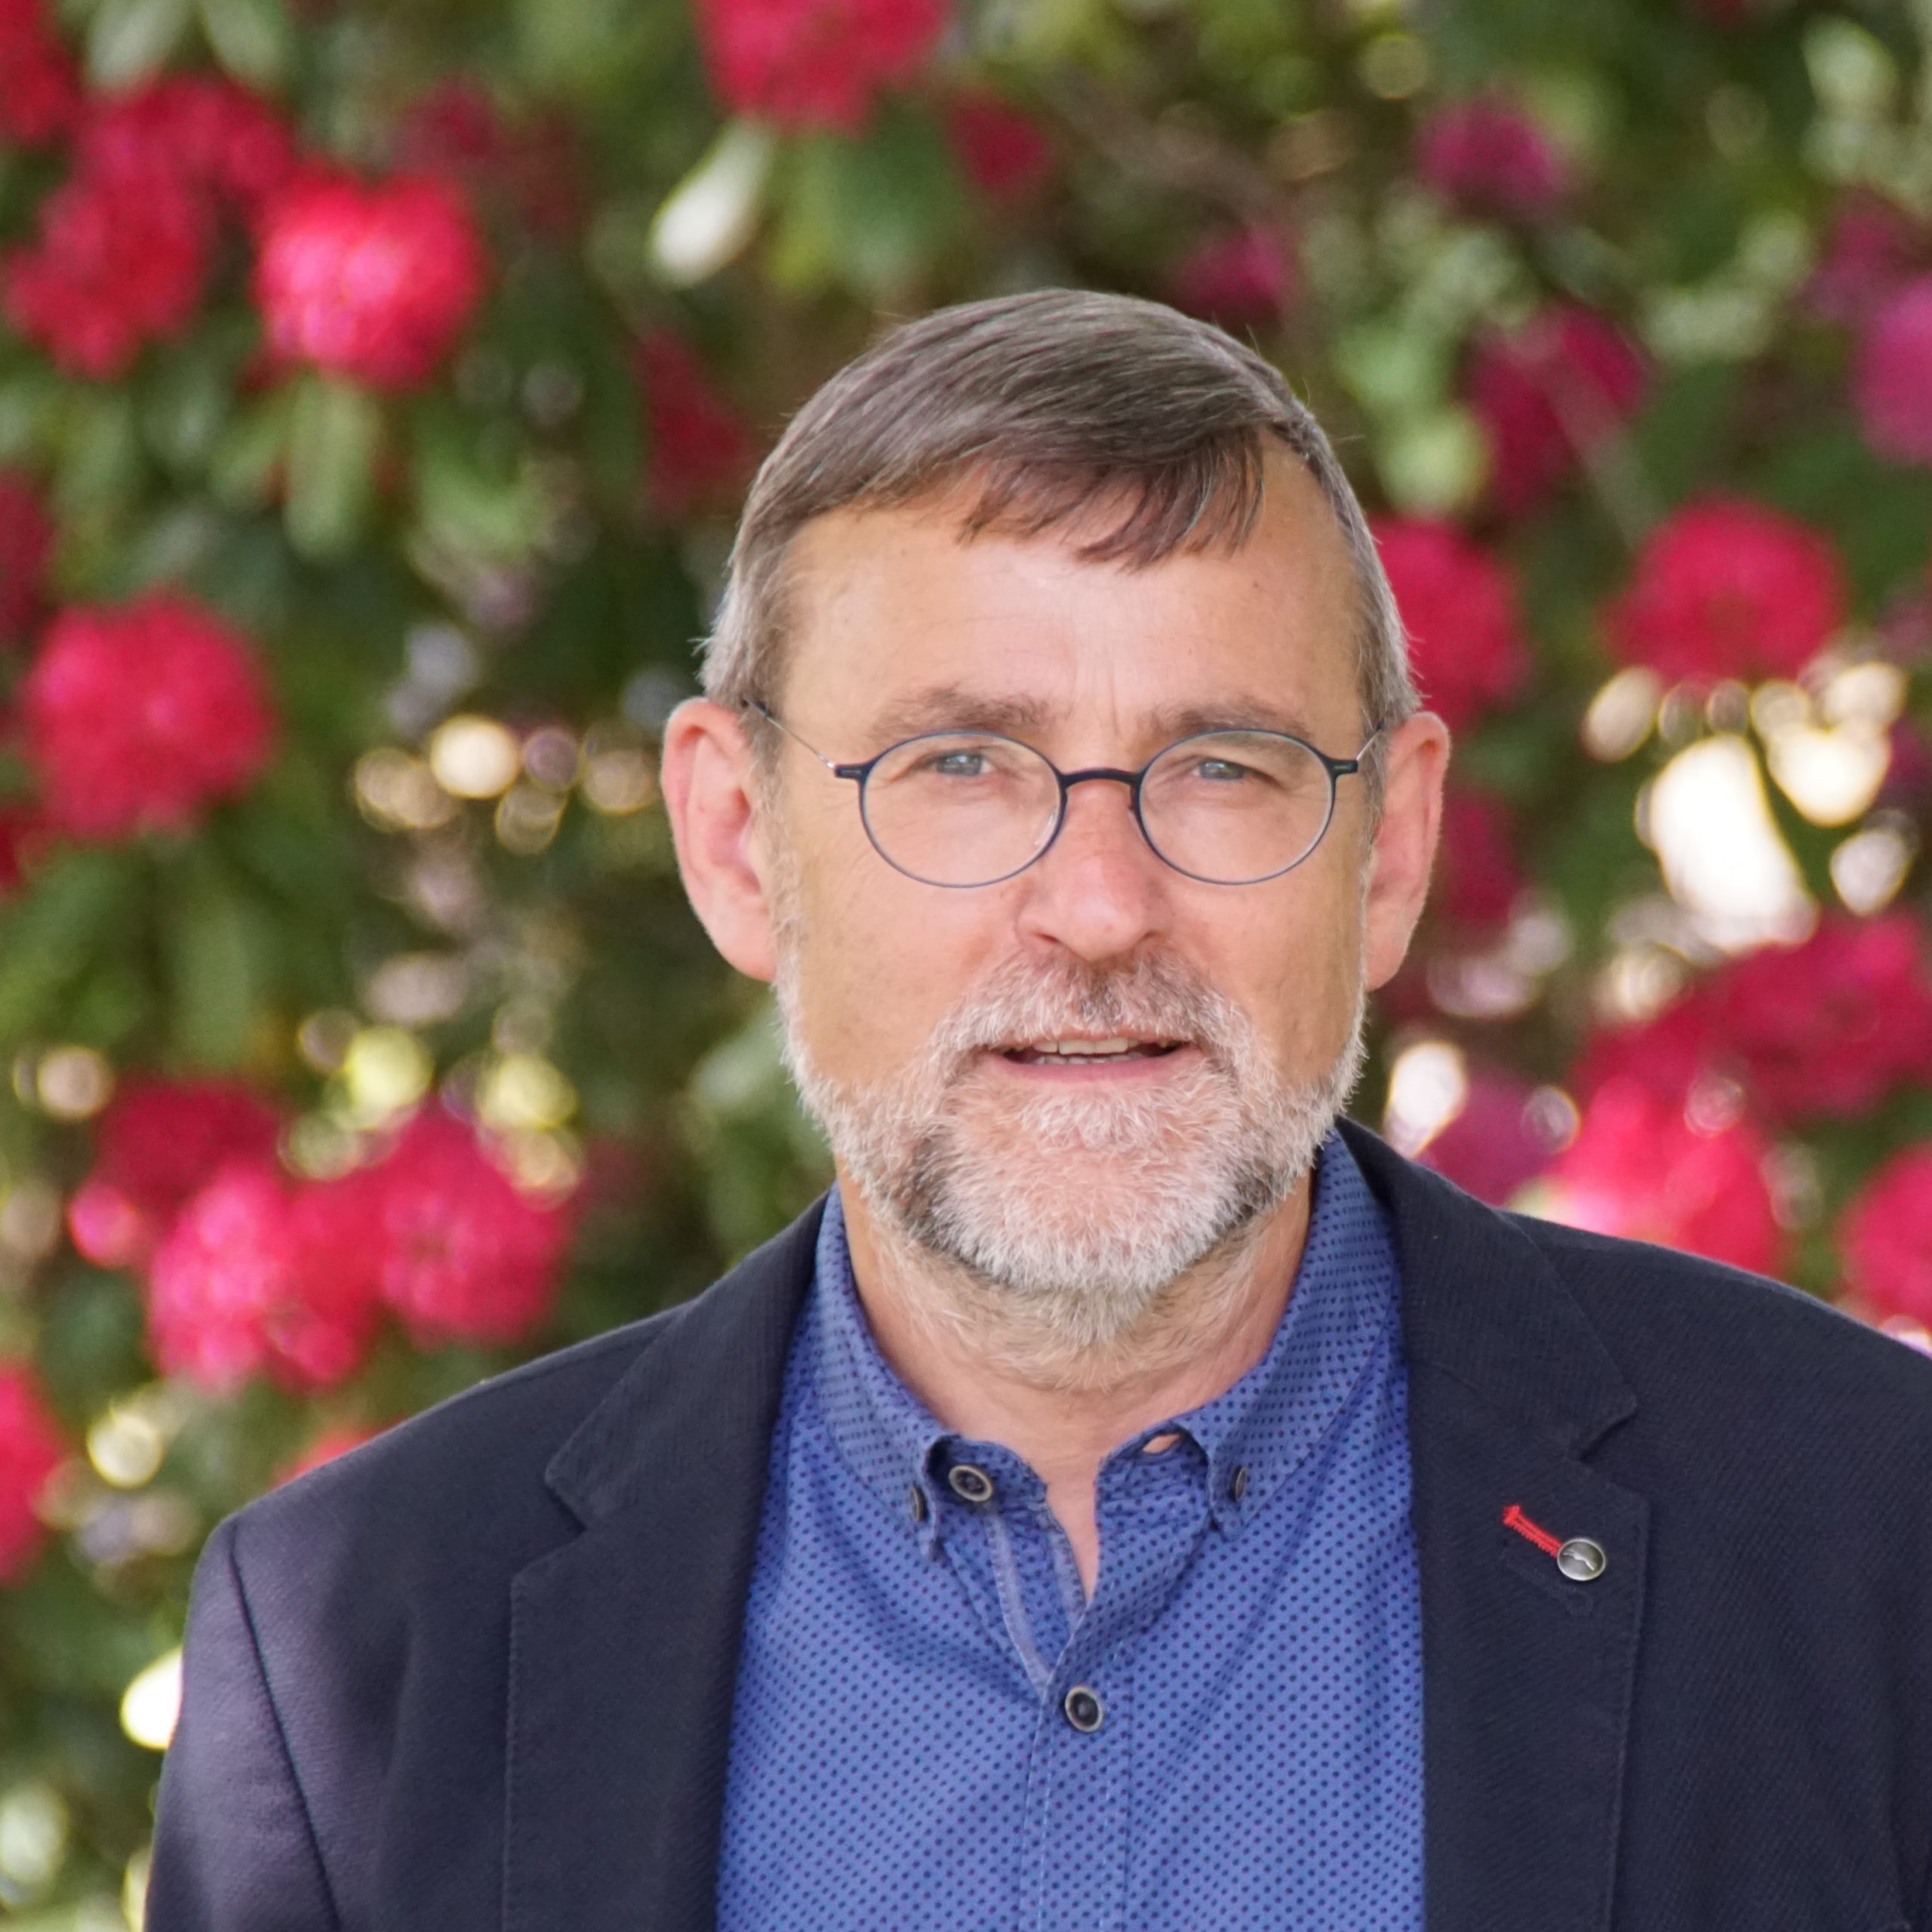 Helmut Woitkowski